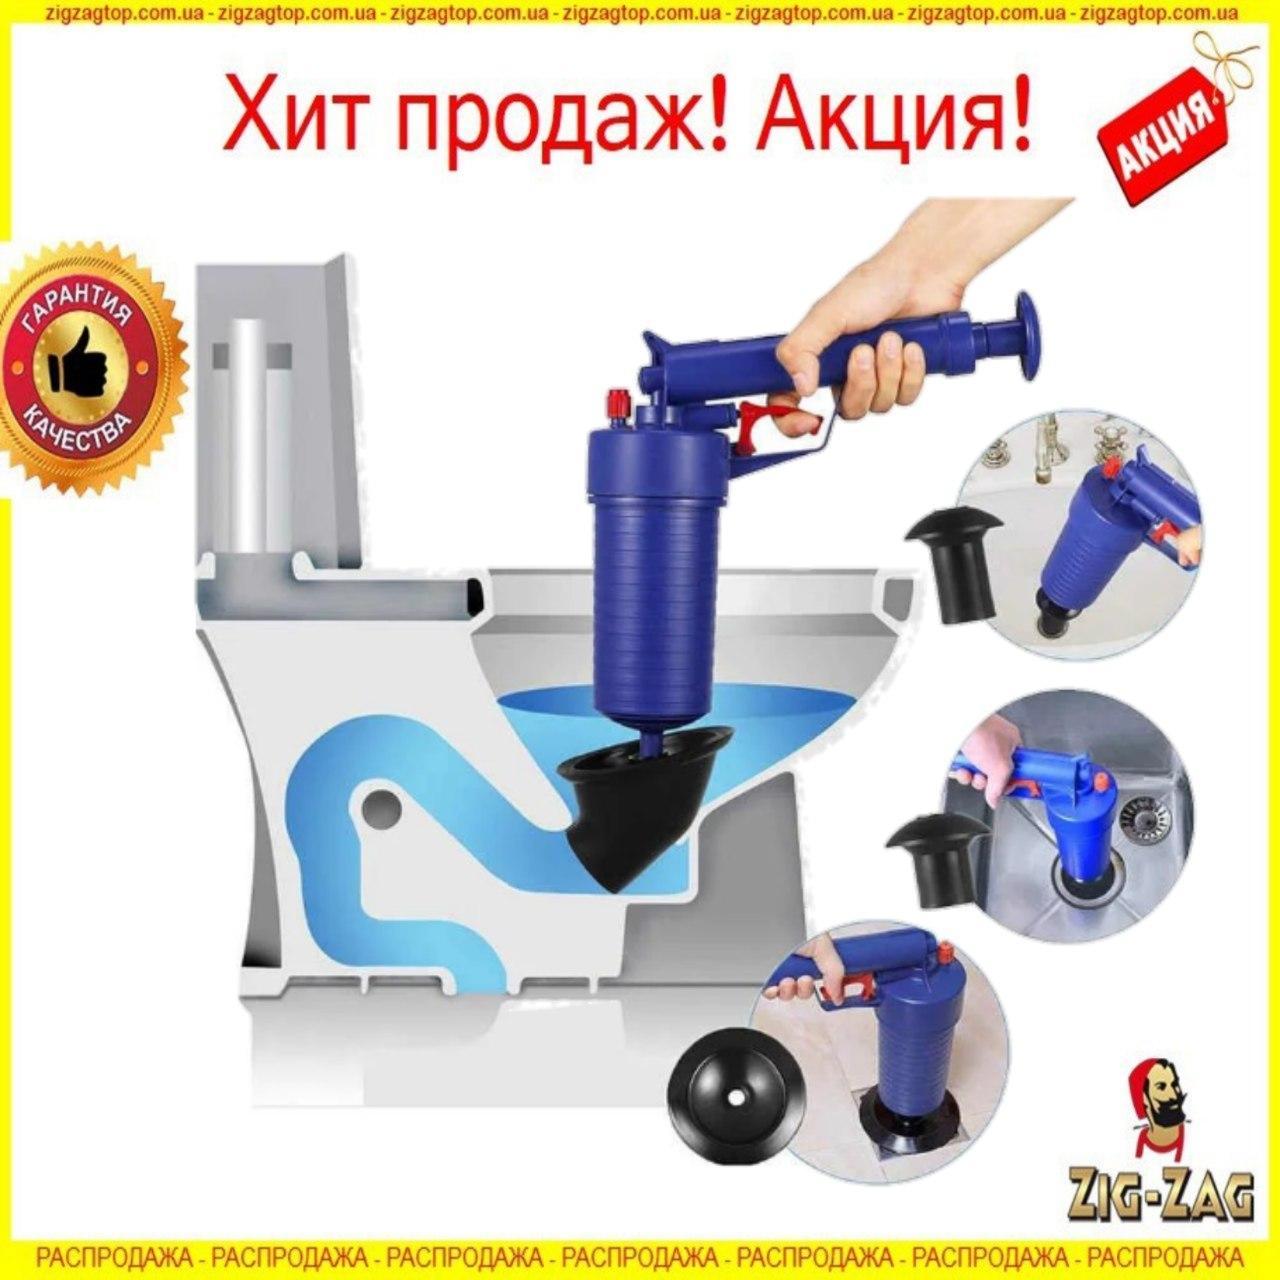 Пневматический Вантуз Toilet dredge GUN BLUE от Засора Труб, Унитаза, Ванны для Канализации, Раковины от Волос